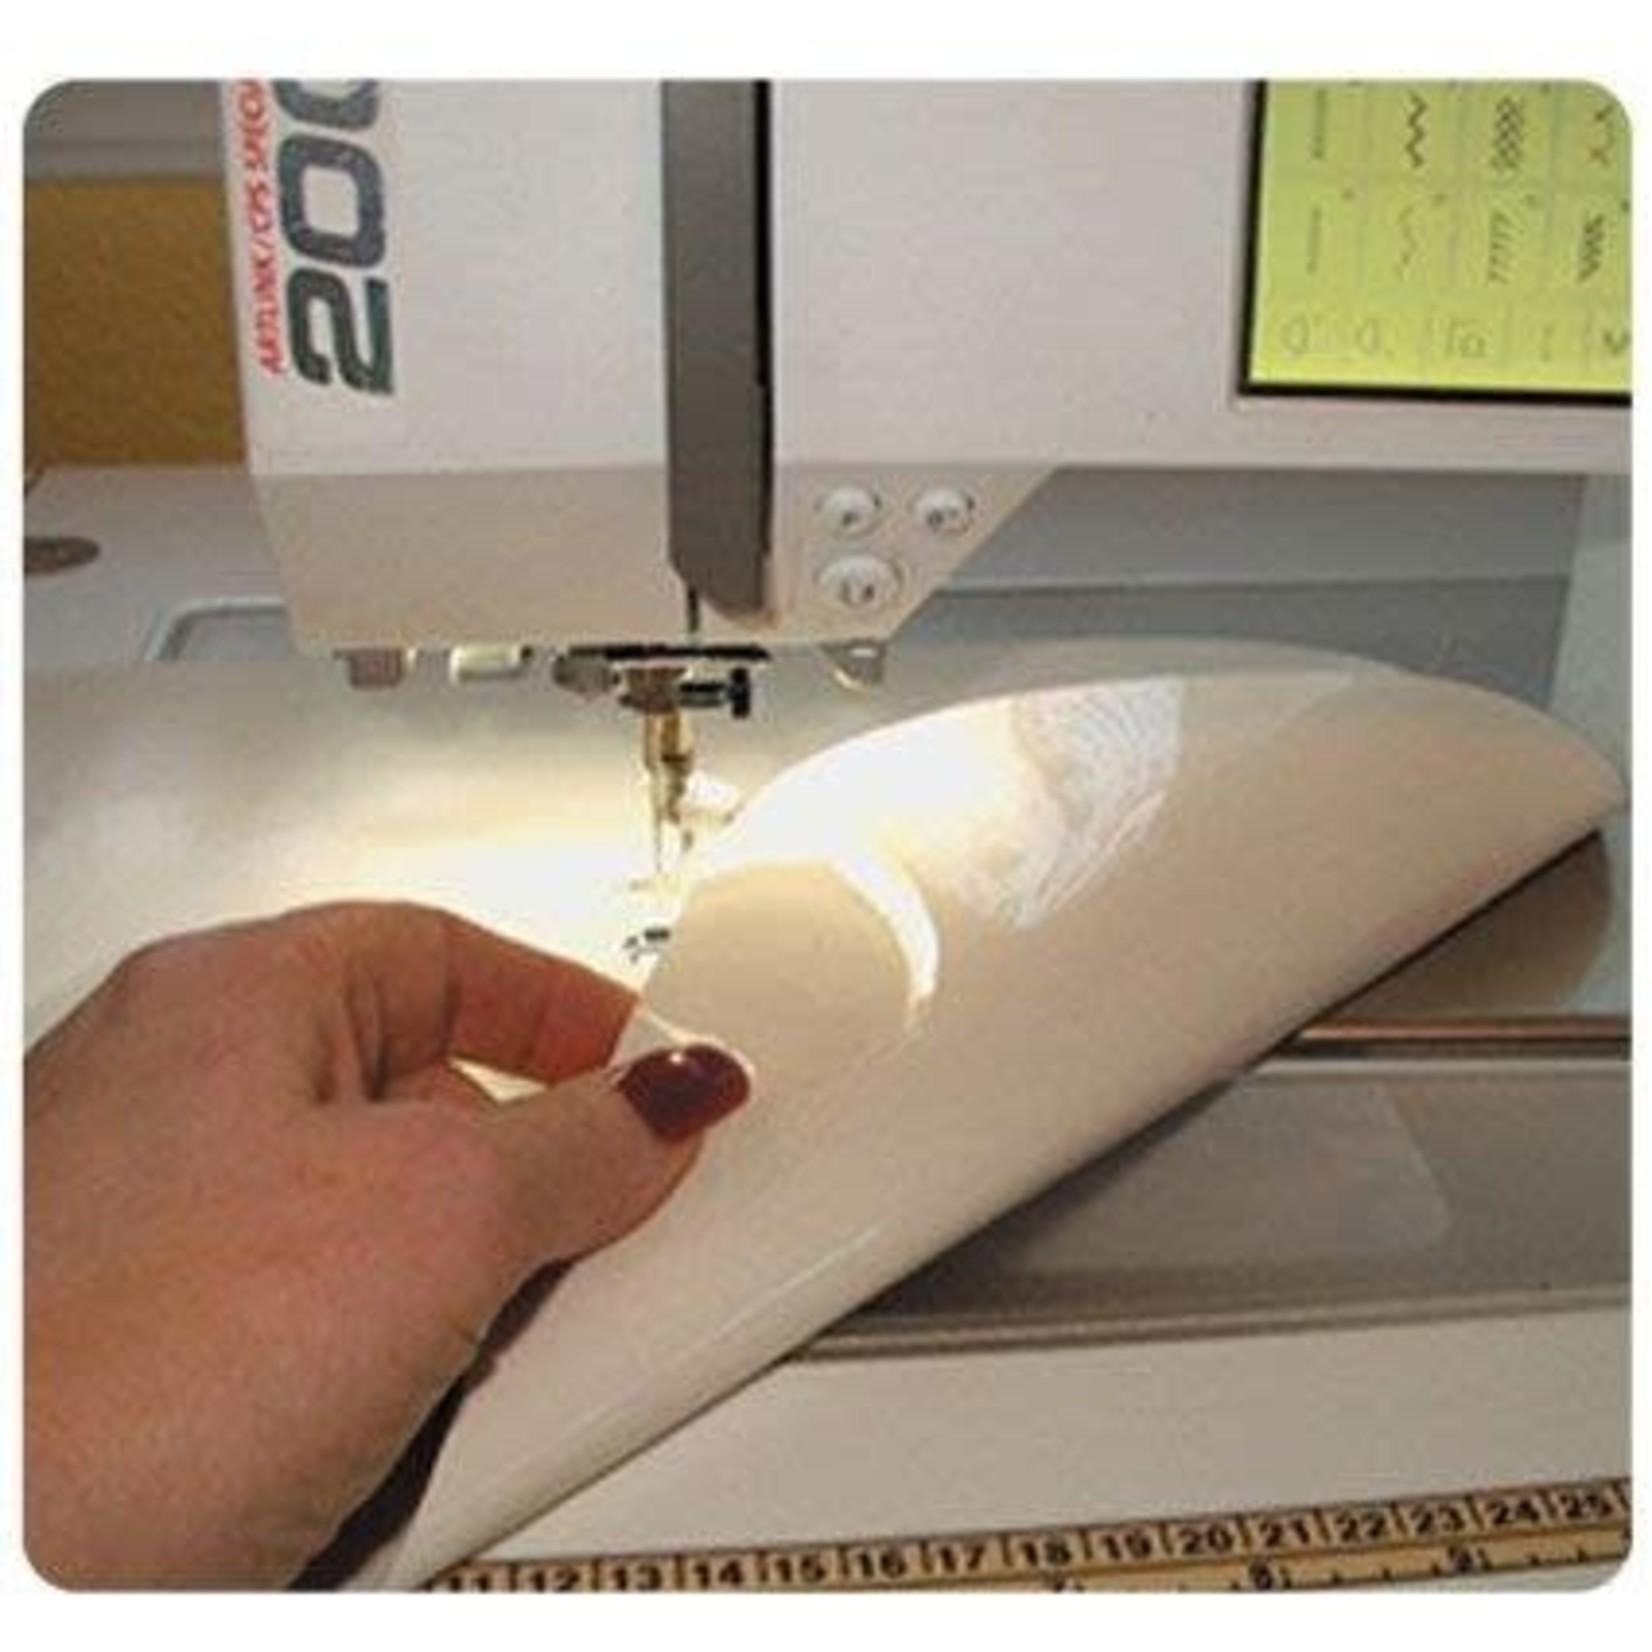 Gossamer Designs Glijmat - Sewslip - met 1/2 inch opening